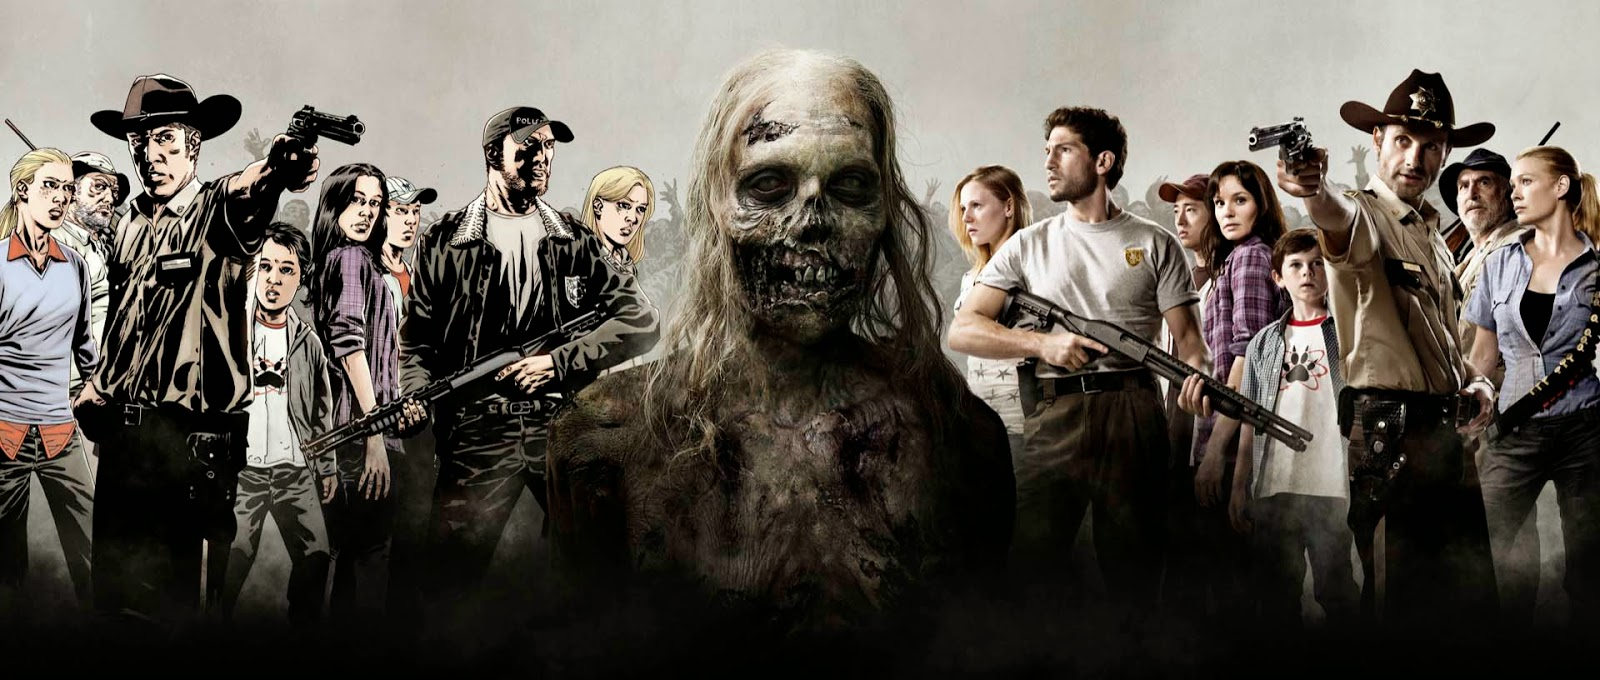 The Walkind Dead Comics vs TV La Tropa Friki